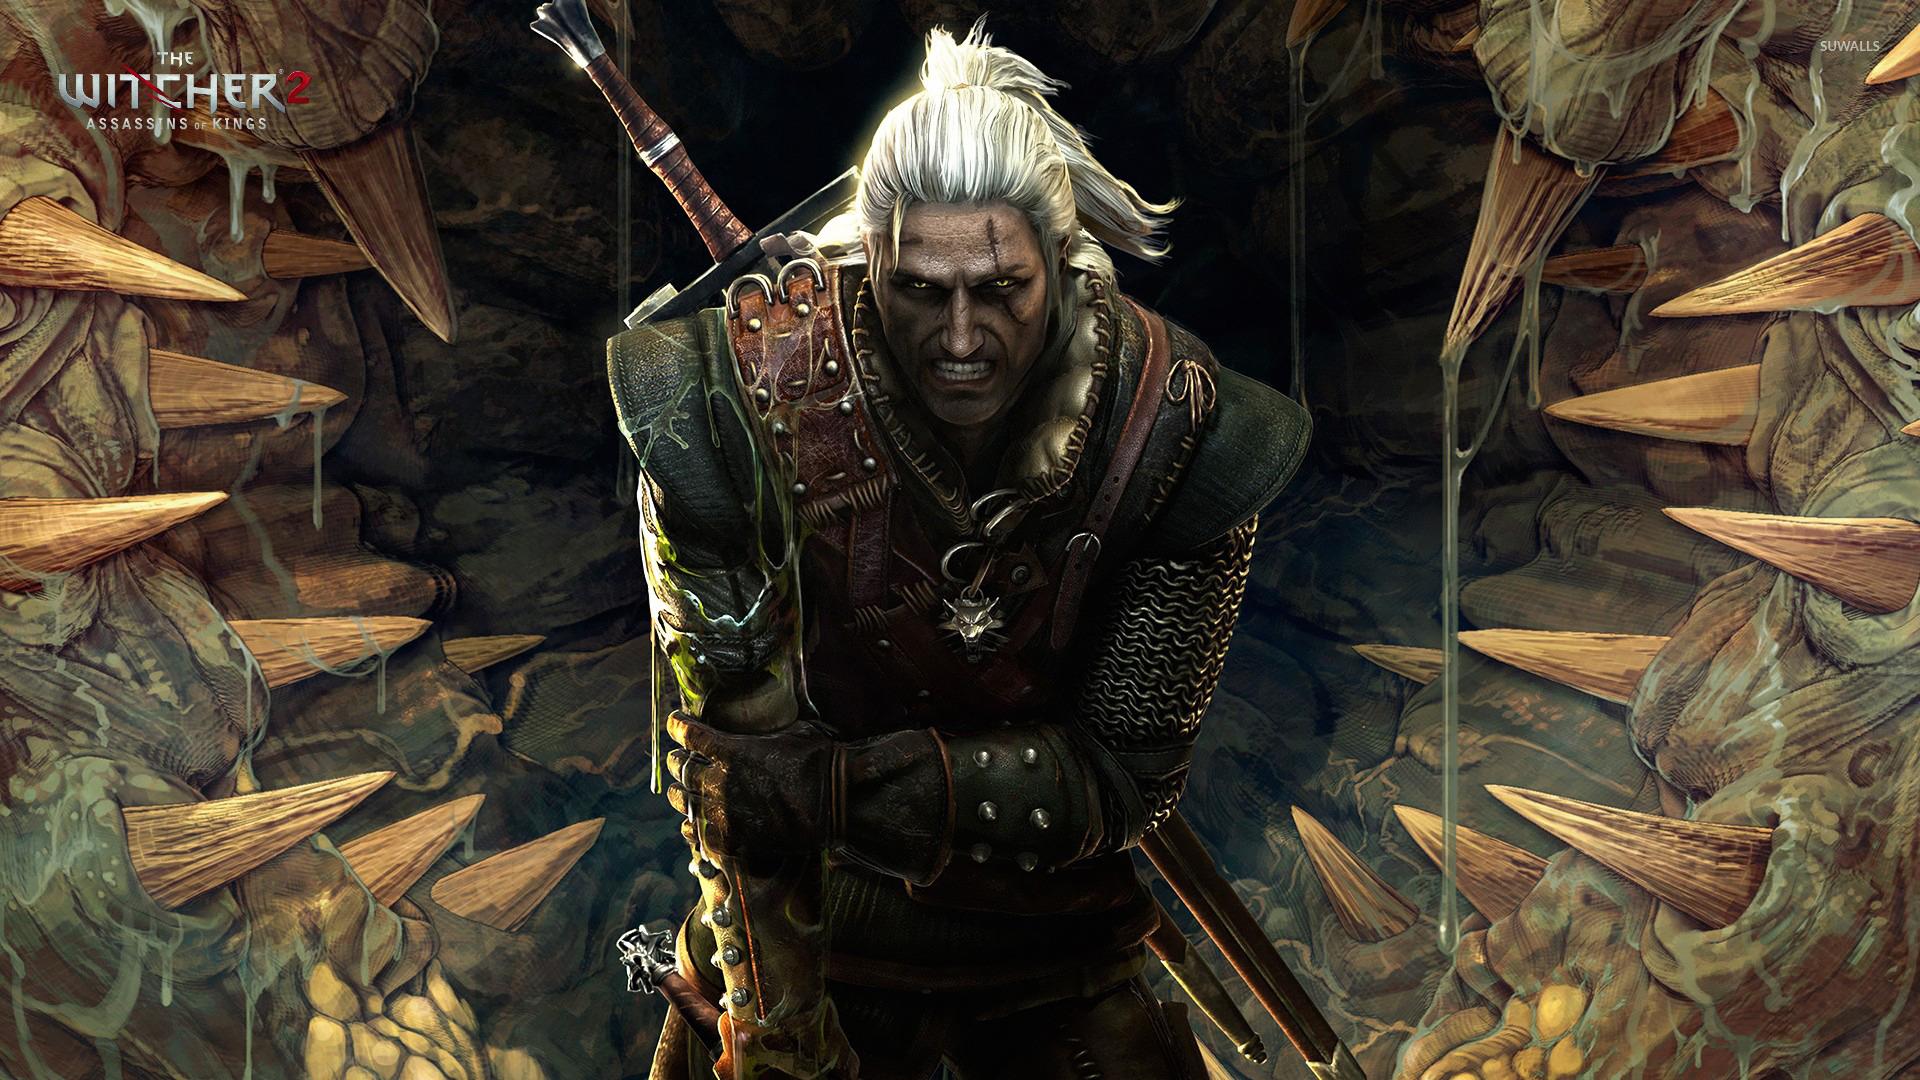 Geralt   The Witcher 2 Assassins of Kings [2] wallpaper   Game 1920x1080